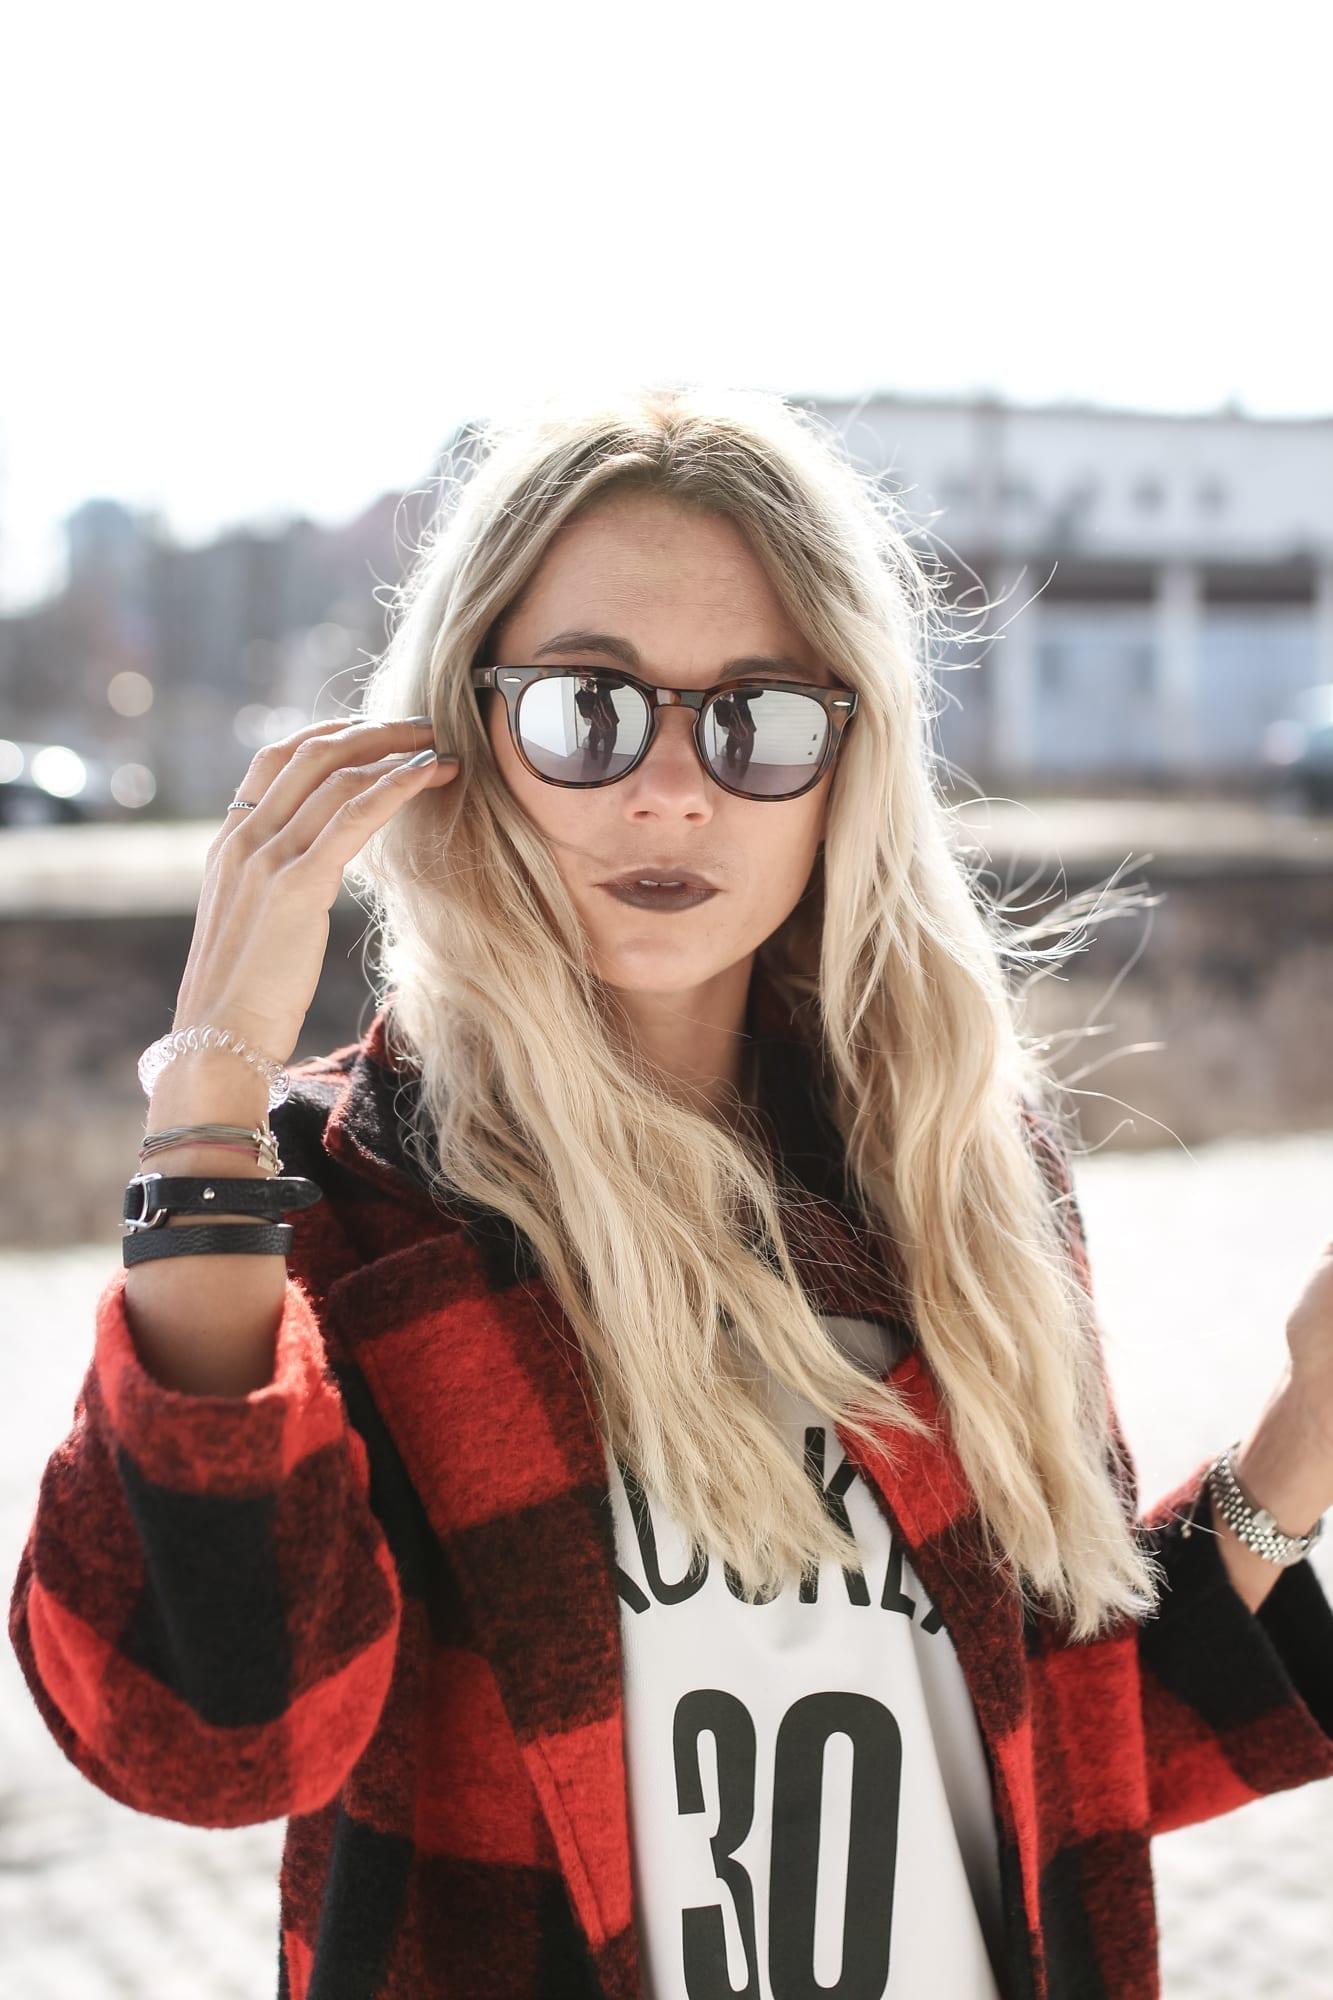 CK_1603_constantlyk_yeezy_fashion-8252